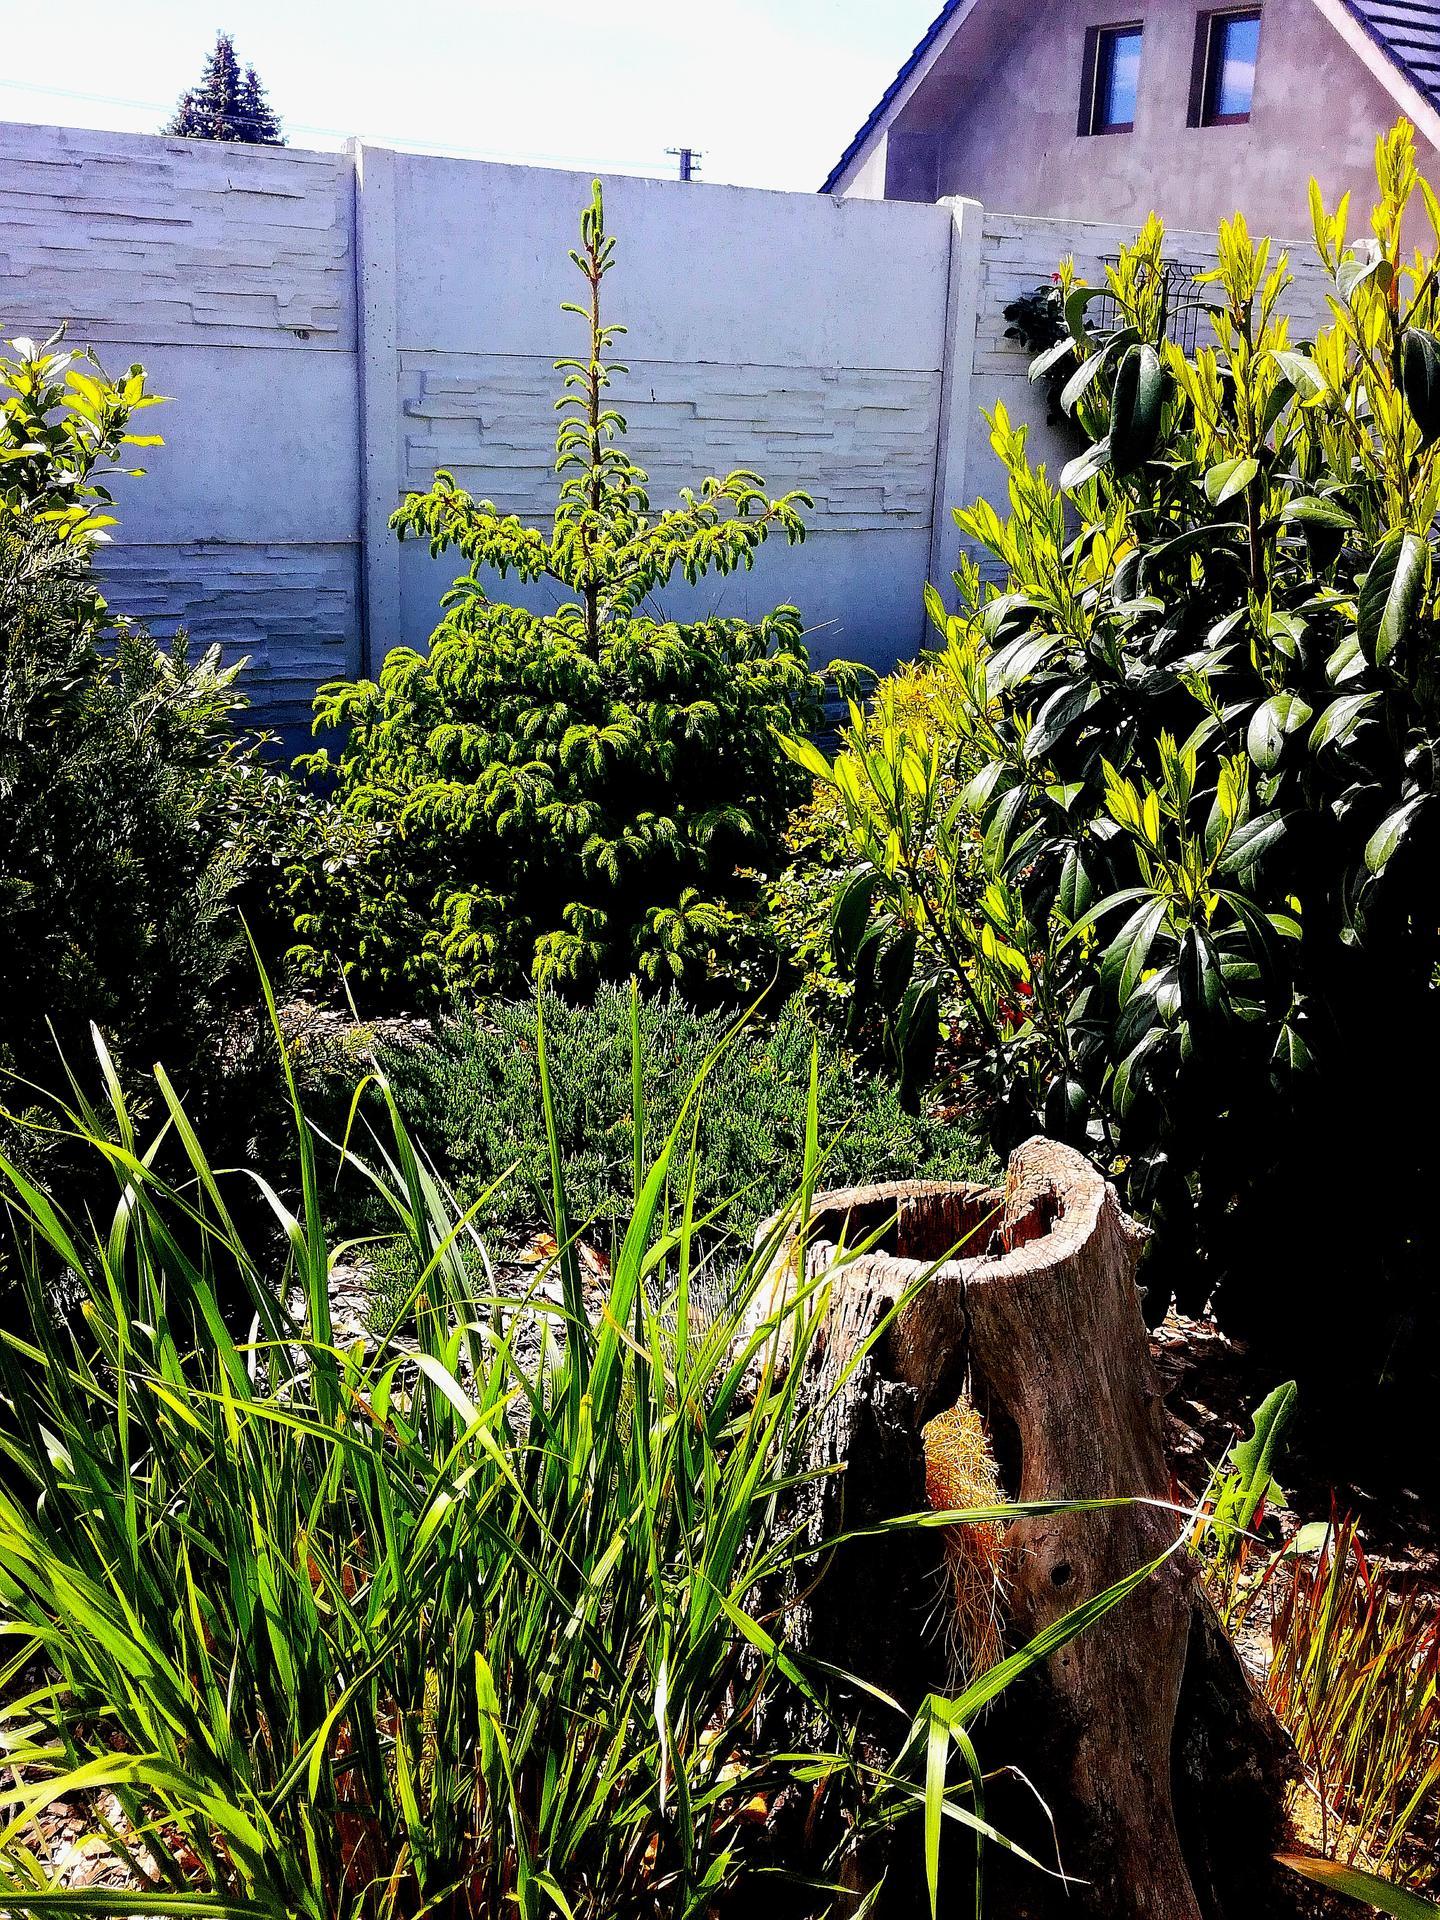 Zahrada 2021 🌲 - Obrázek č. 86